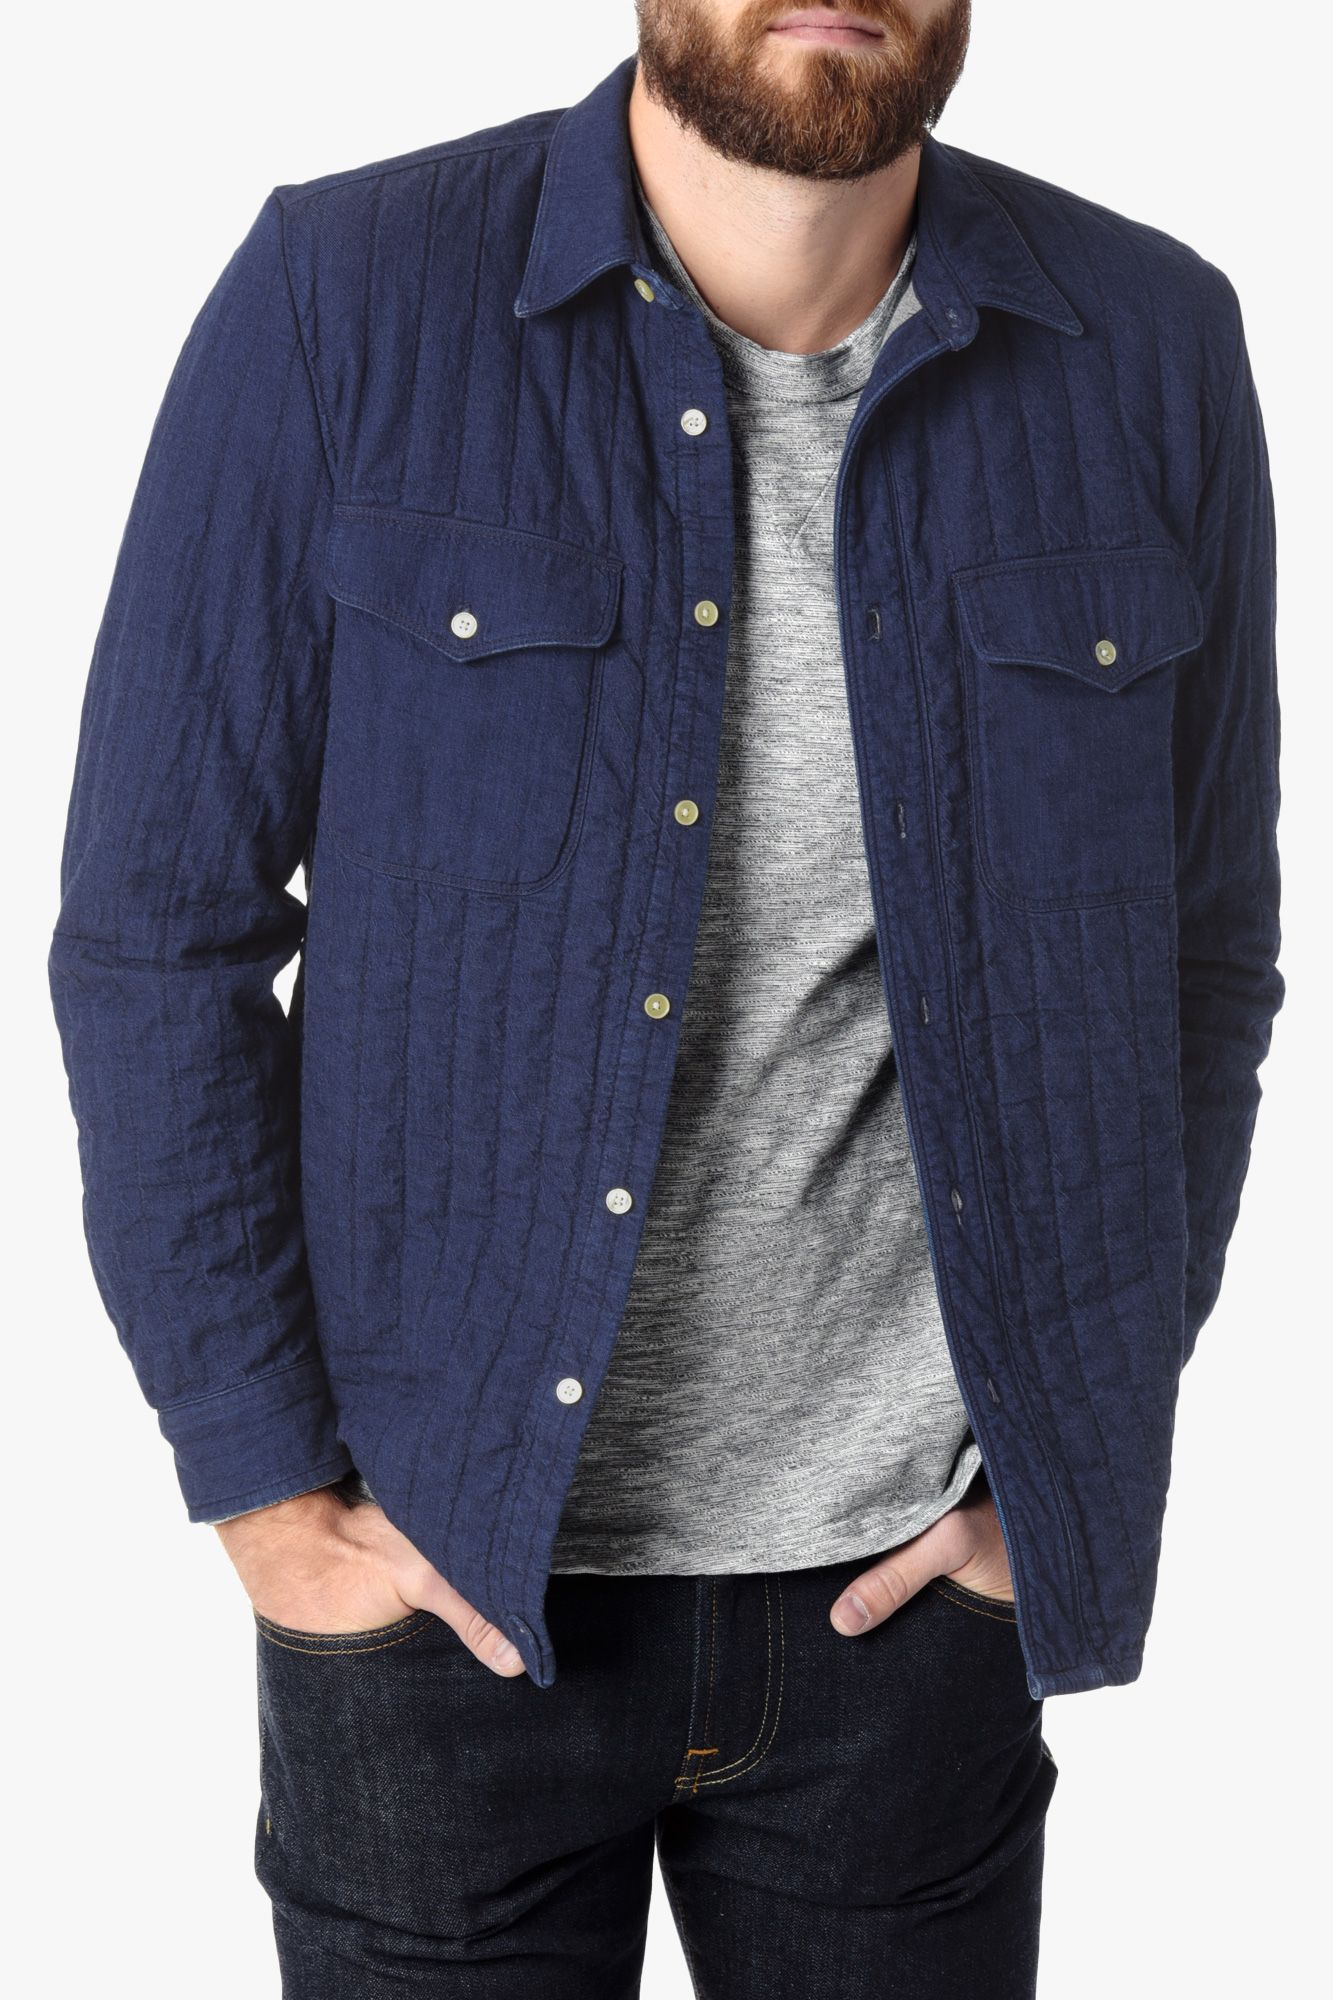 ab03f889b10f Men s Blue Quilted Denim Shirt Jacket In Indigo